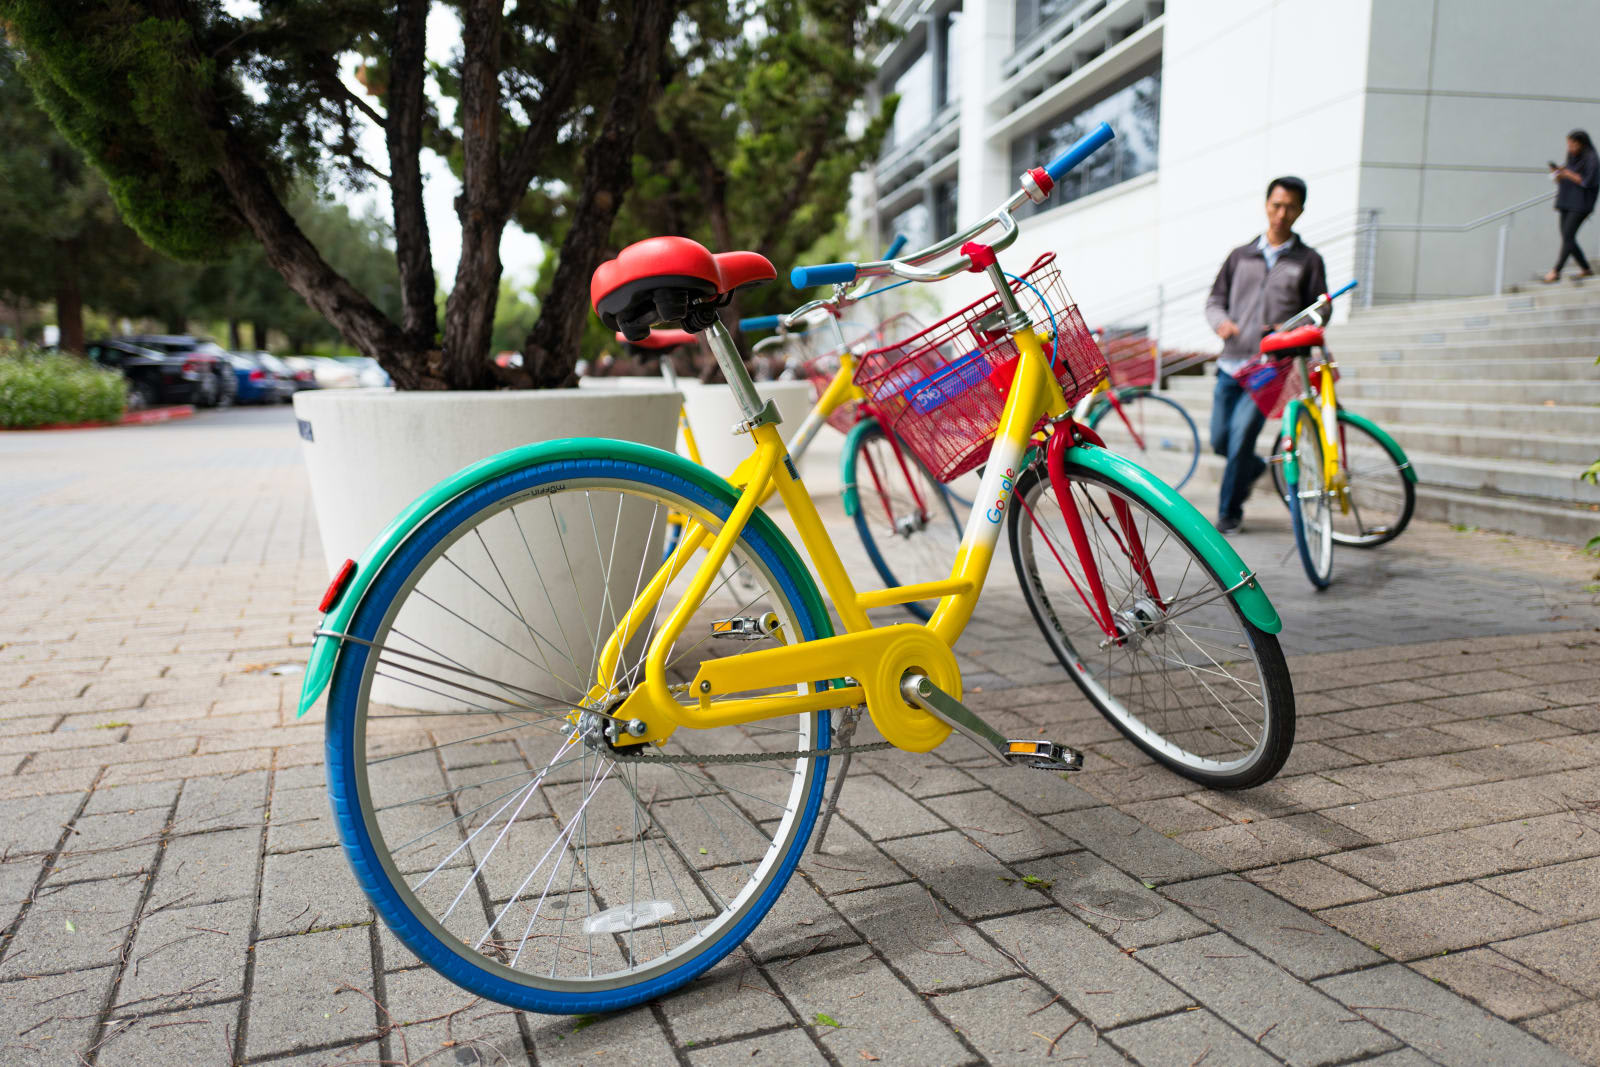 Google uses GPS and smart locks to secure wayward campus bikes